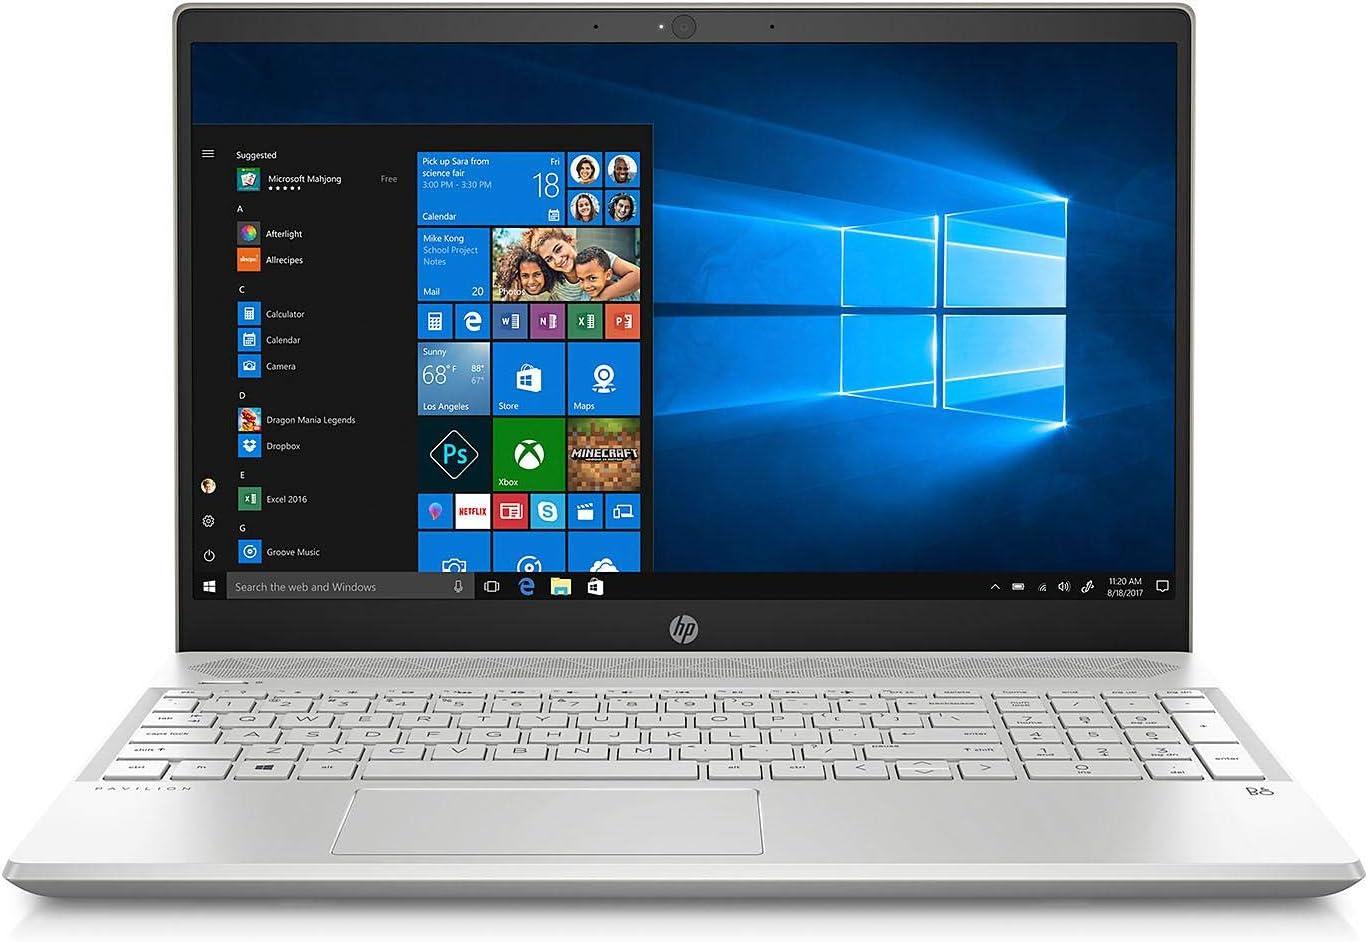 "HP Smart Buy EliteBook 840 G5 4QK82UT Laptop (Windows 10 Pro, Intel i5-8250U, 14"" LCD Screen, Storage: 128 GB, RAM: 8 GB) Black/Grey"